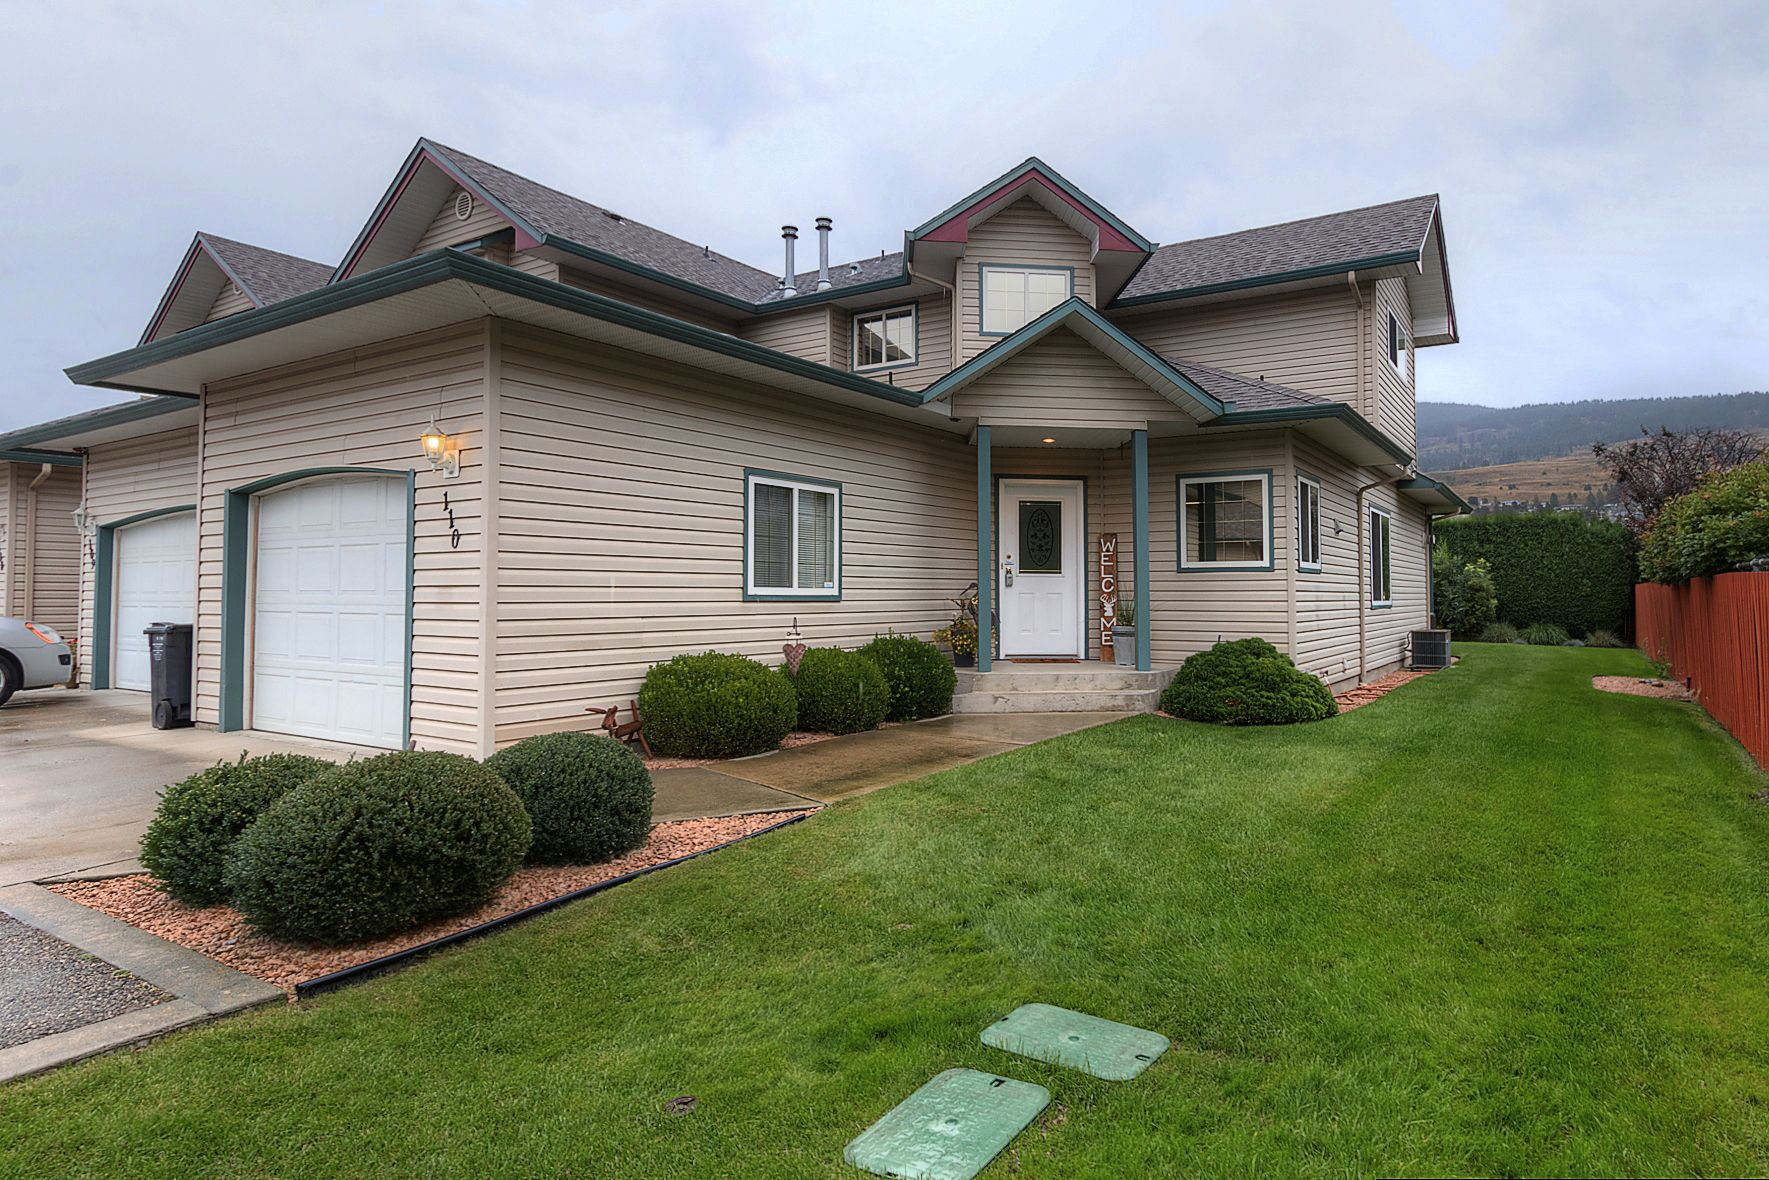 Main Photo: 110 11387 bottom wood lake Road: lake country House for sale (central okanagan)  : MLS®# 10191856